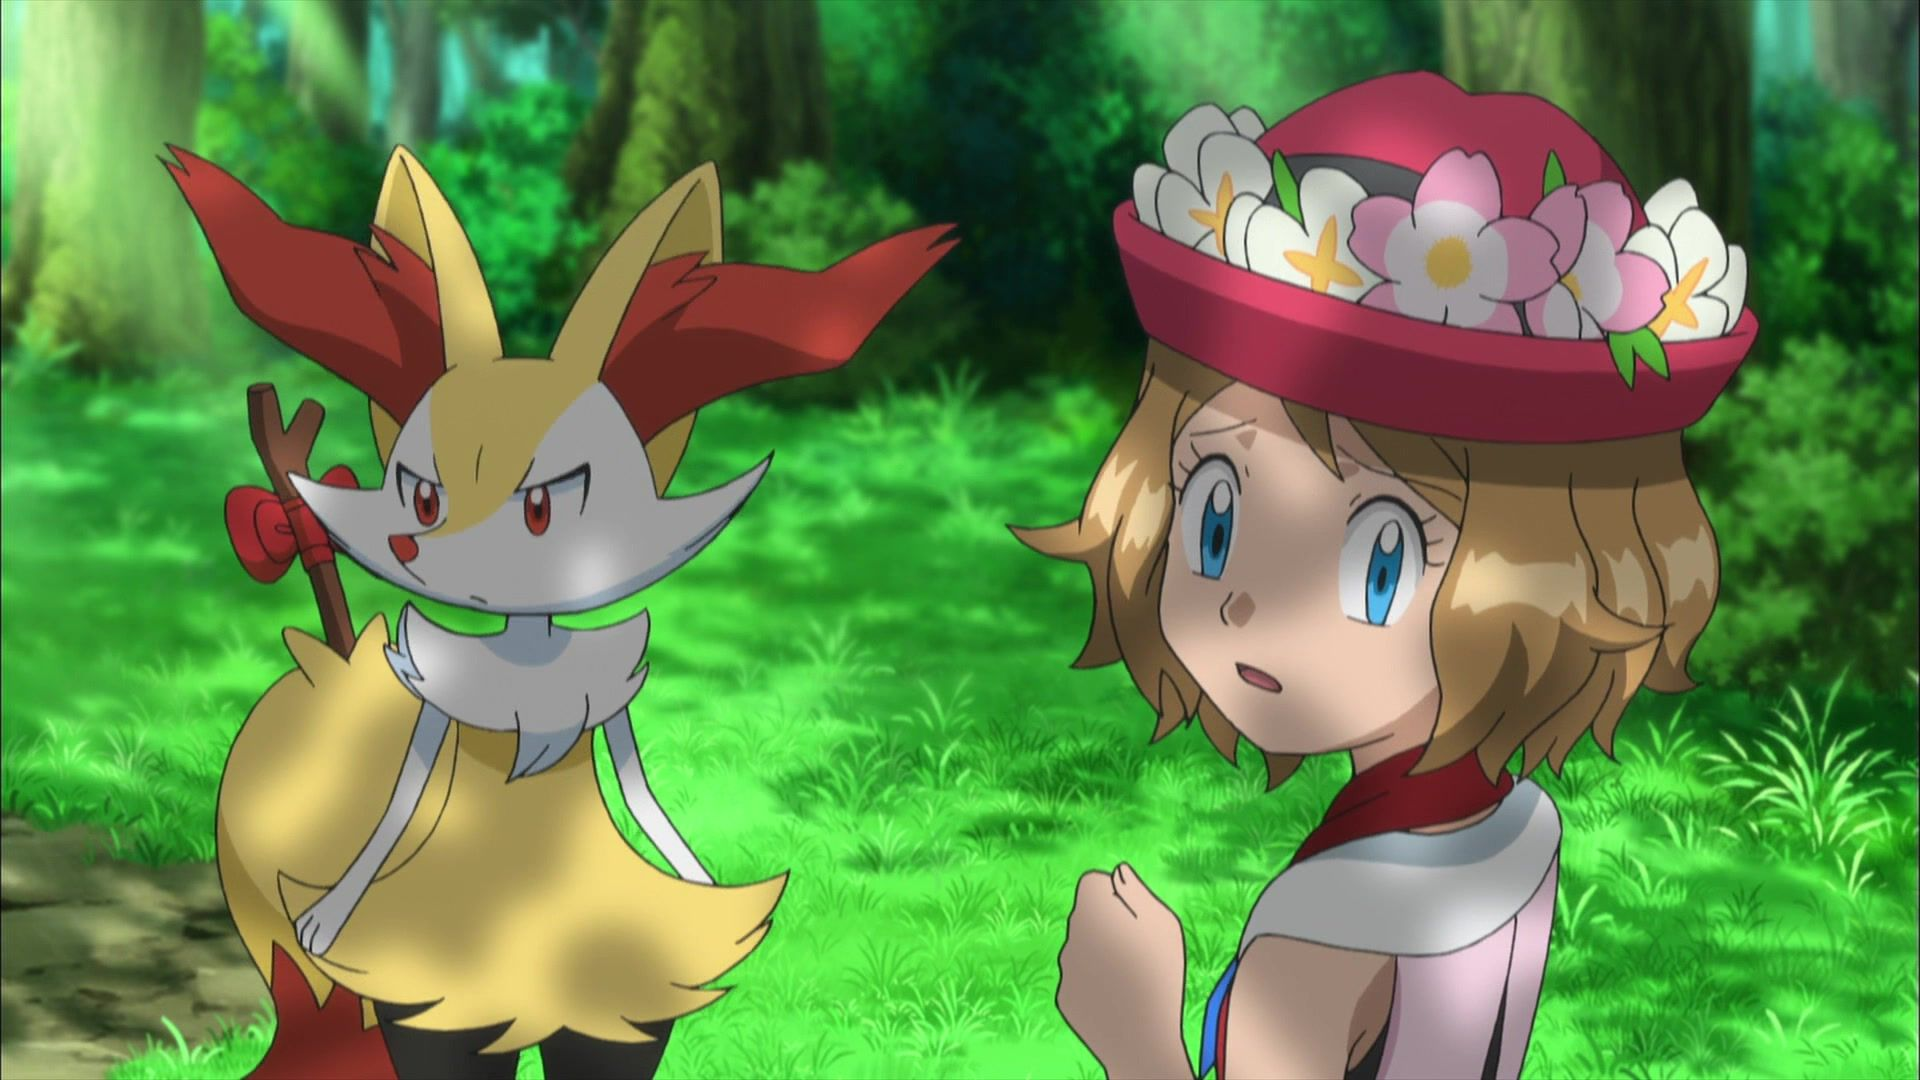 Pokemon - Anime Wallpaper (23987259) - Fanpop